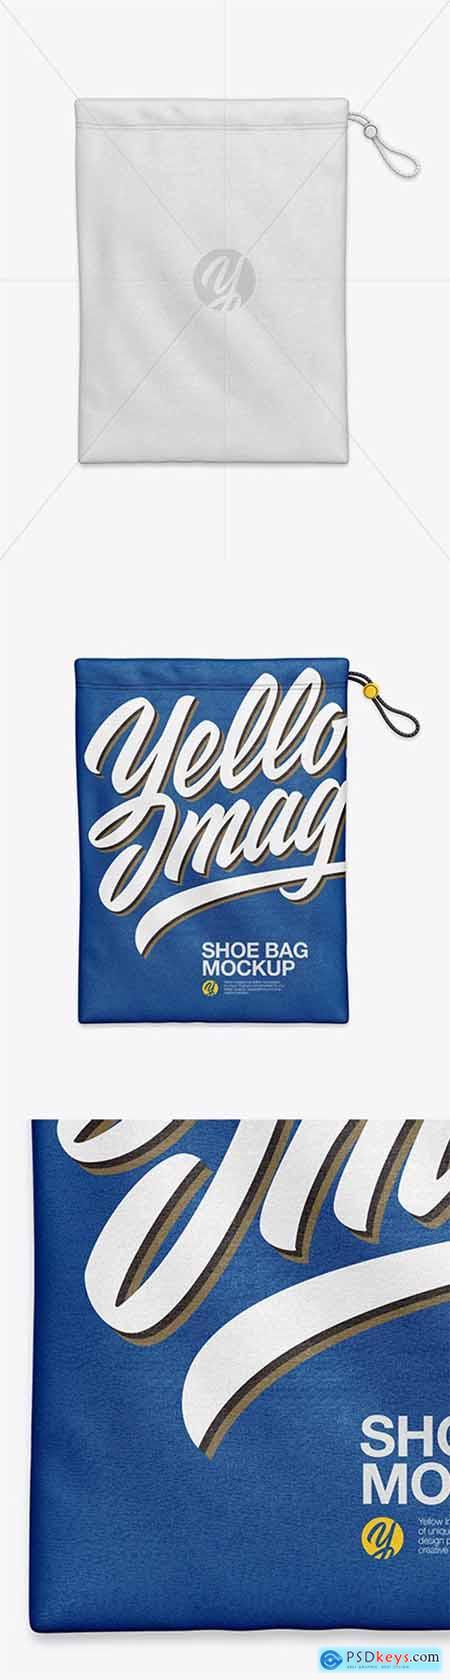 Shoe Bag Mockup 23574